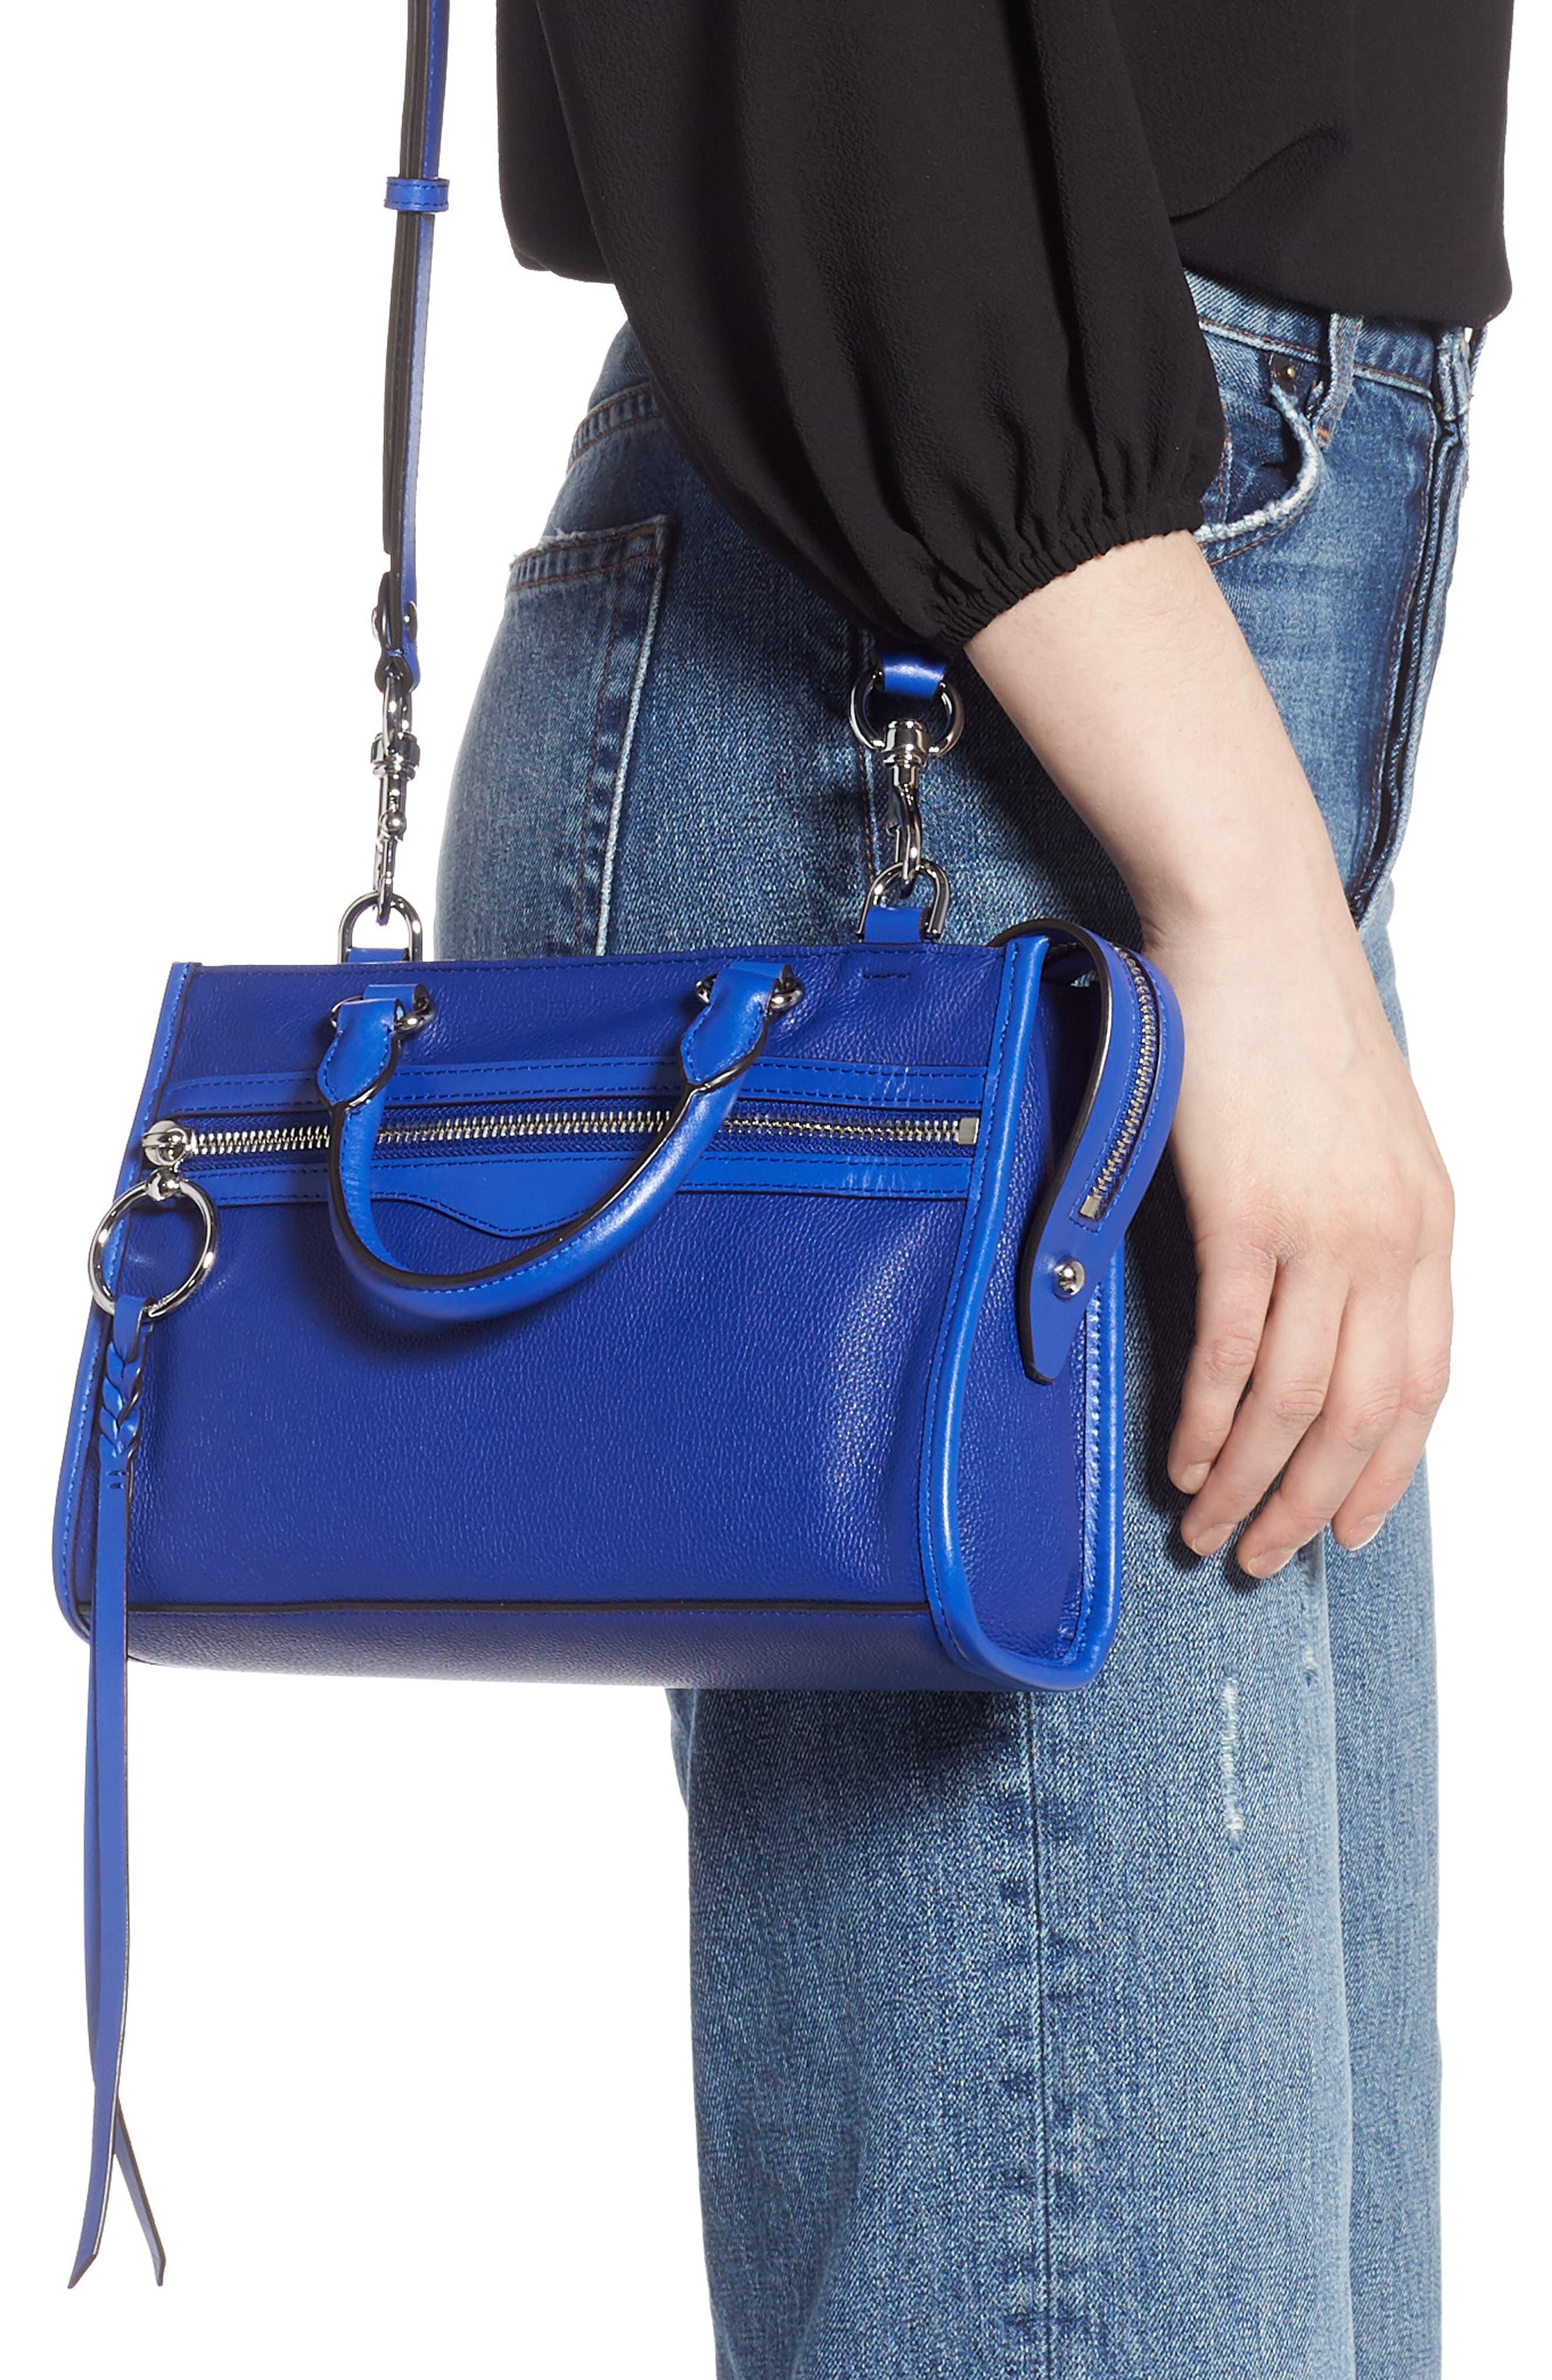 REBECCA MINKOFF, Micro Bedford Leather Satchel, Alternate thumbnail 2, color, BRIGHT BLUE